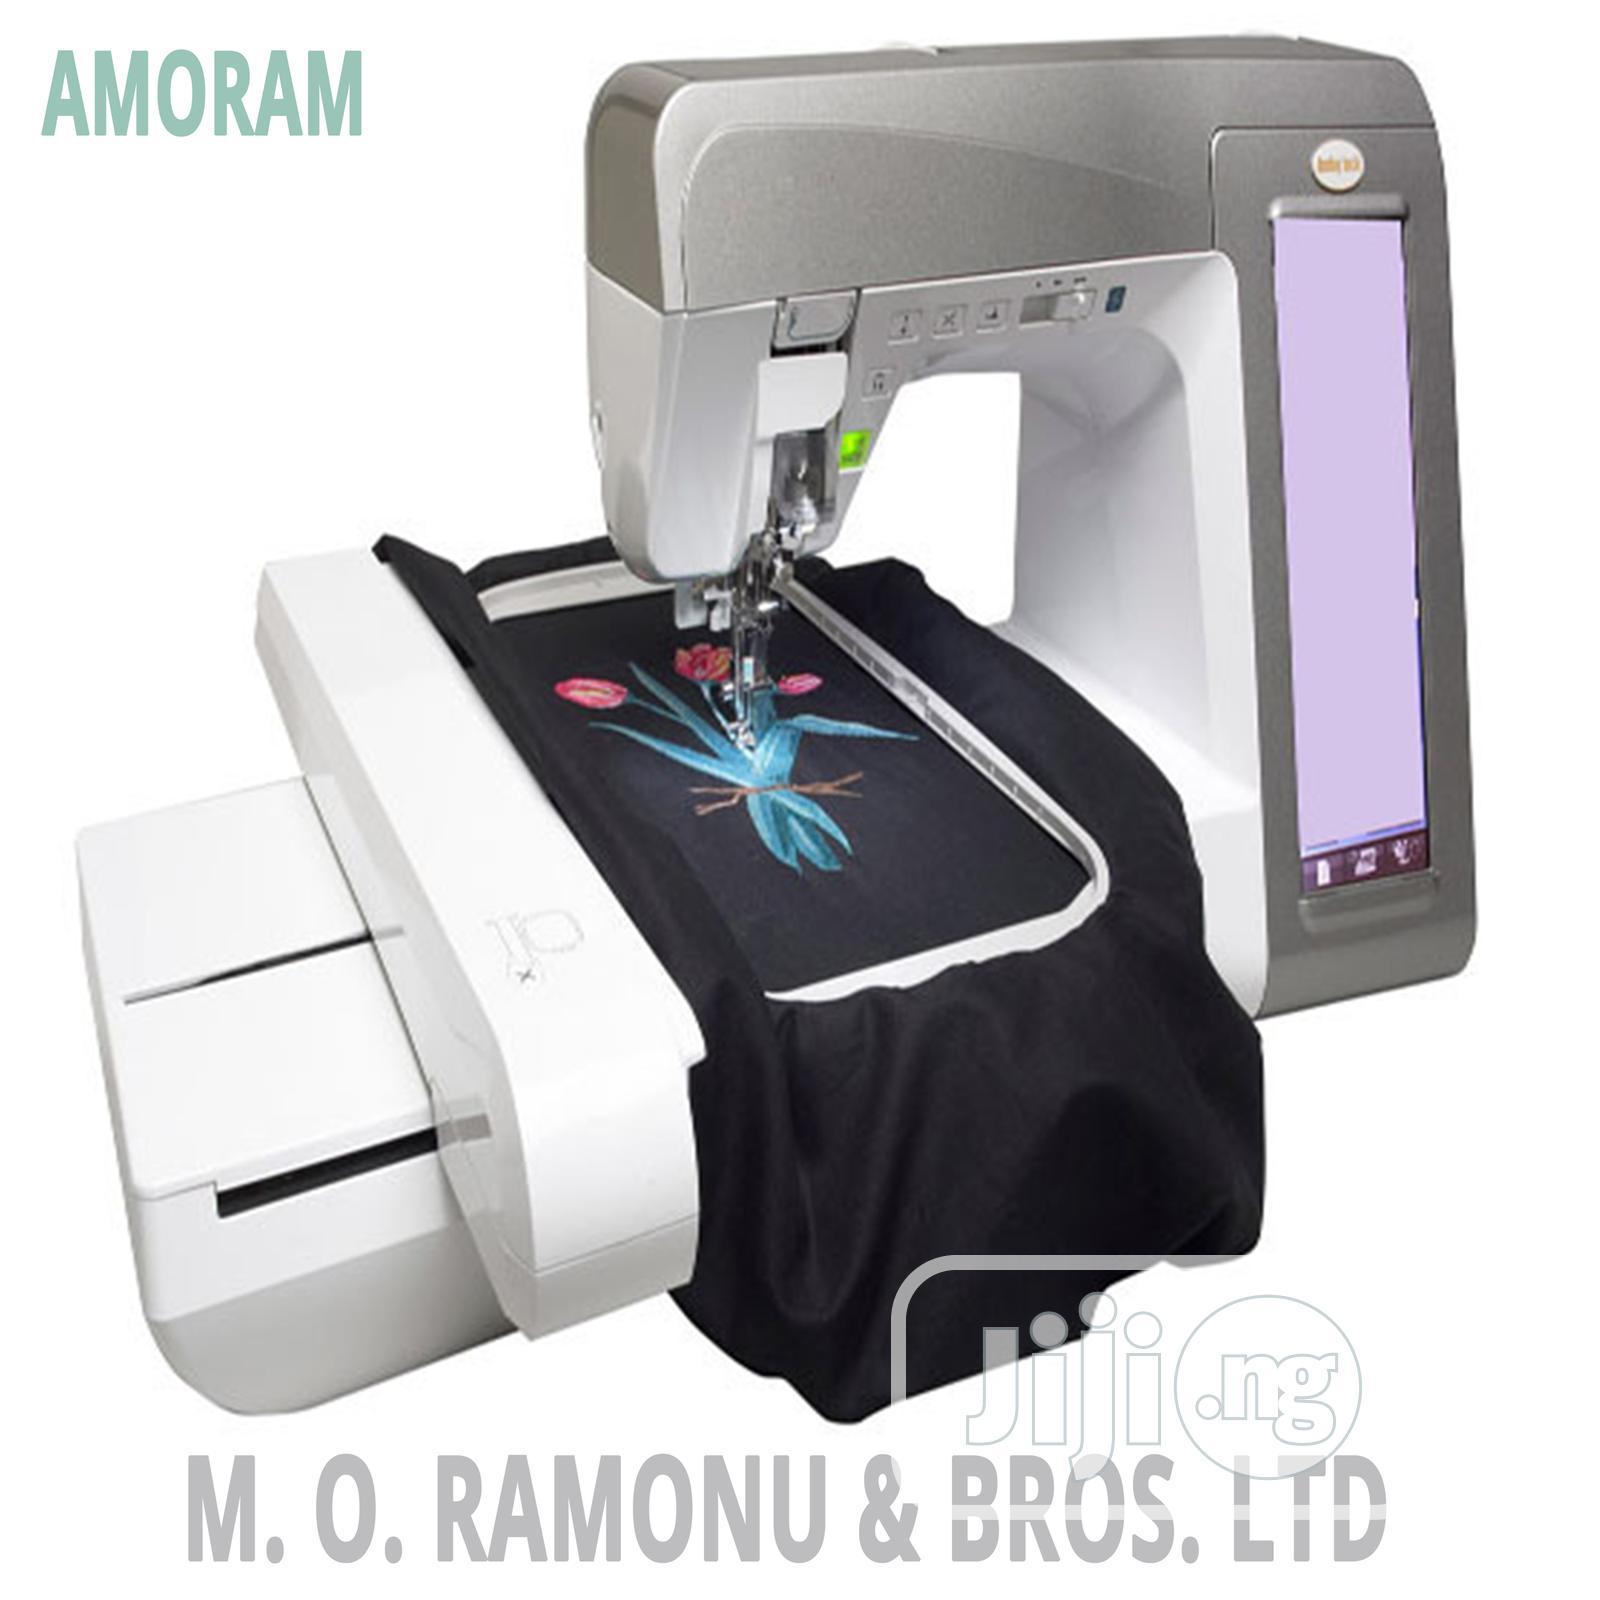 Original Embroidery Sewing Machine